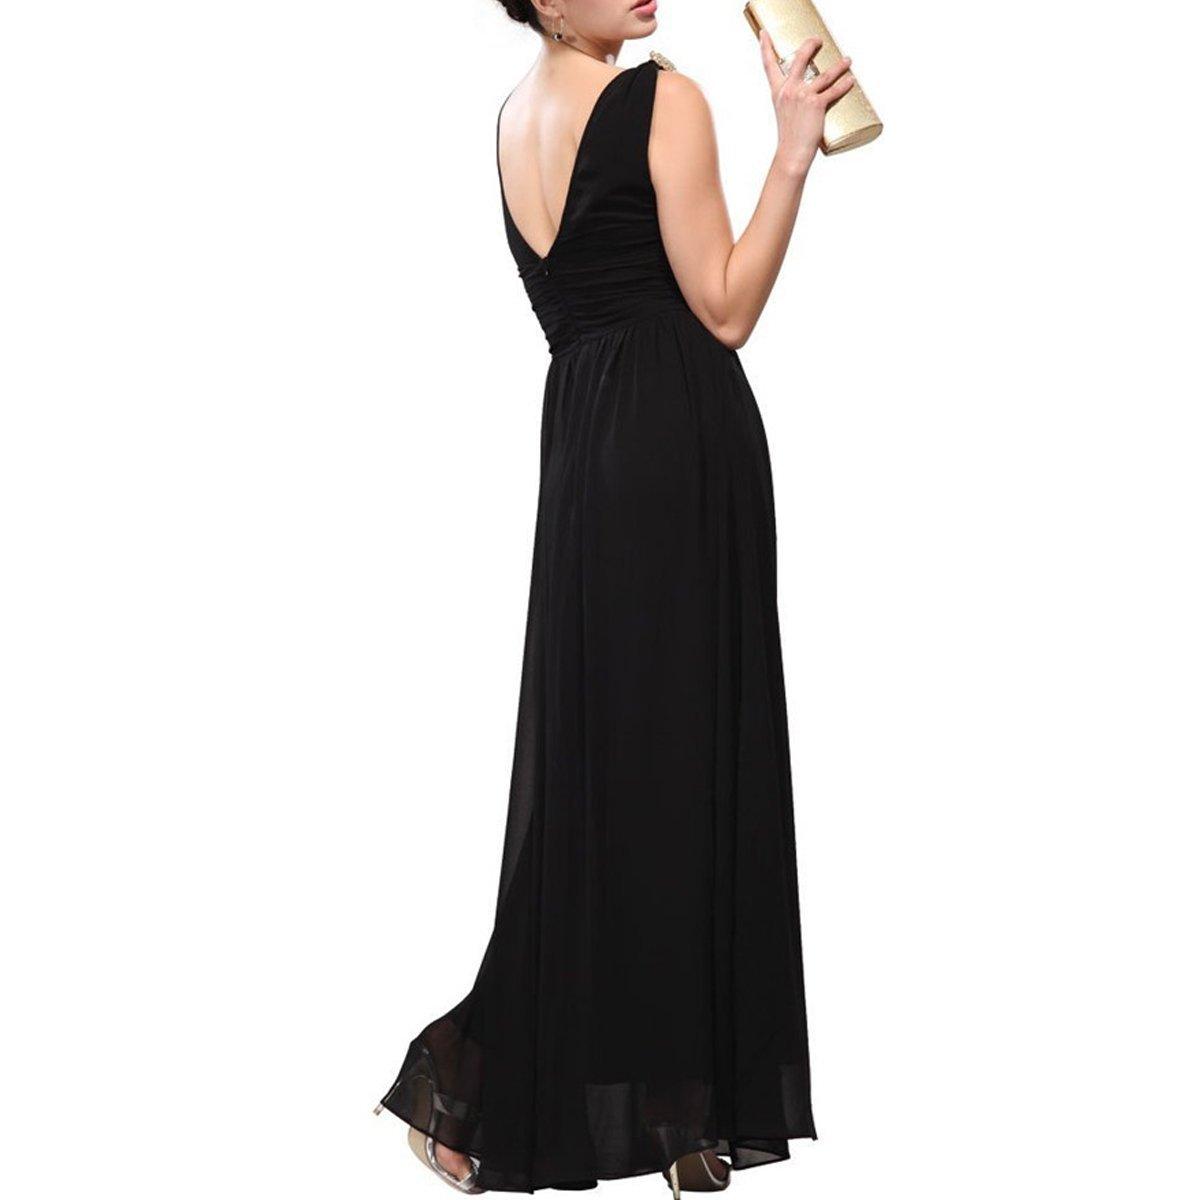 06202b4c6f KAXIDY Ladies Evening Dresses Wedding Holiday Beach Maxi Gowns: Amazon.co.uk :